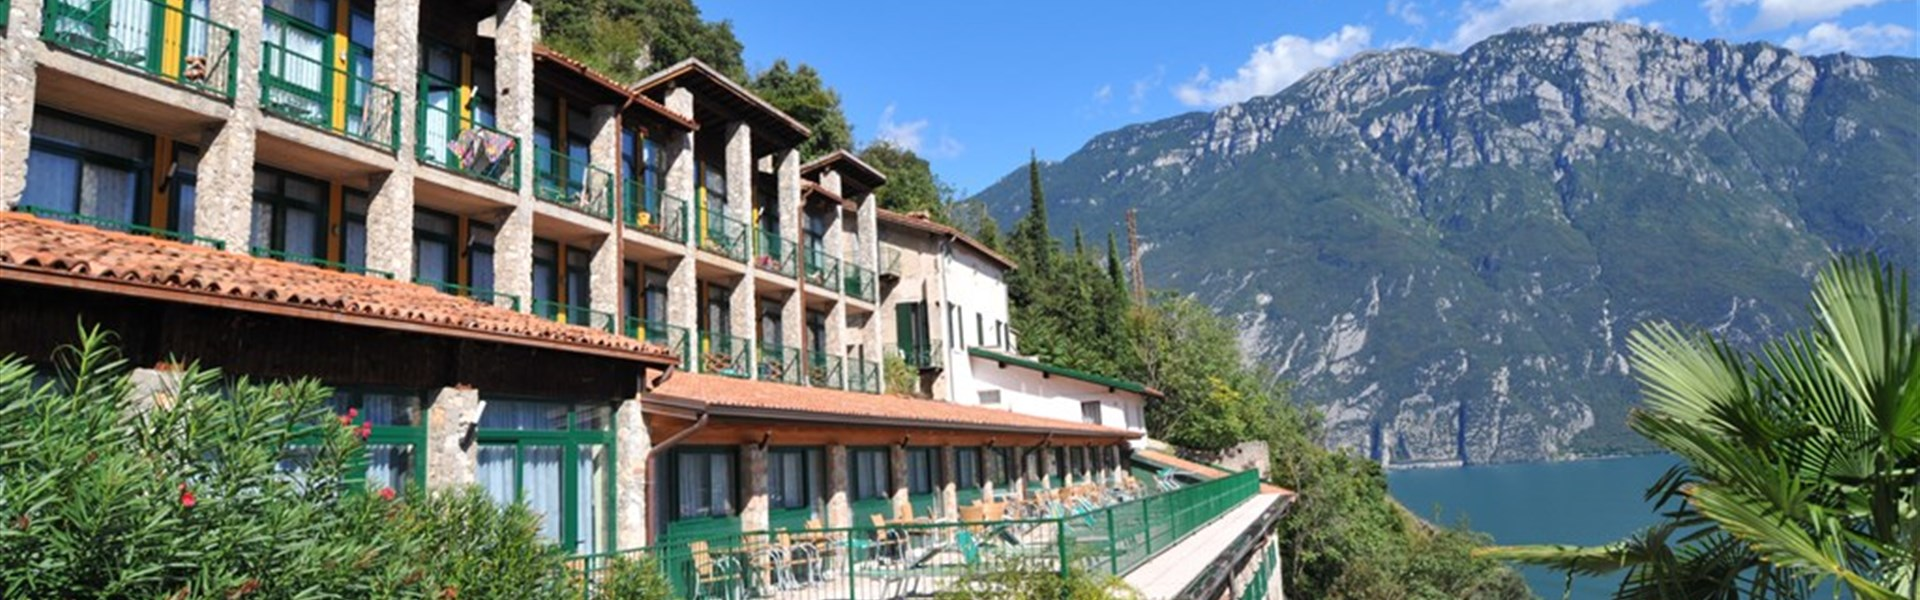 Hotel La Limonaia -